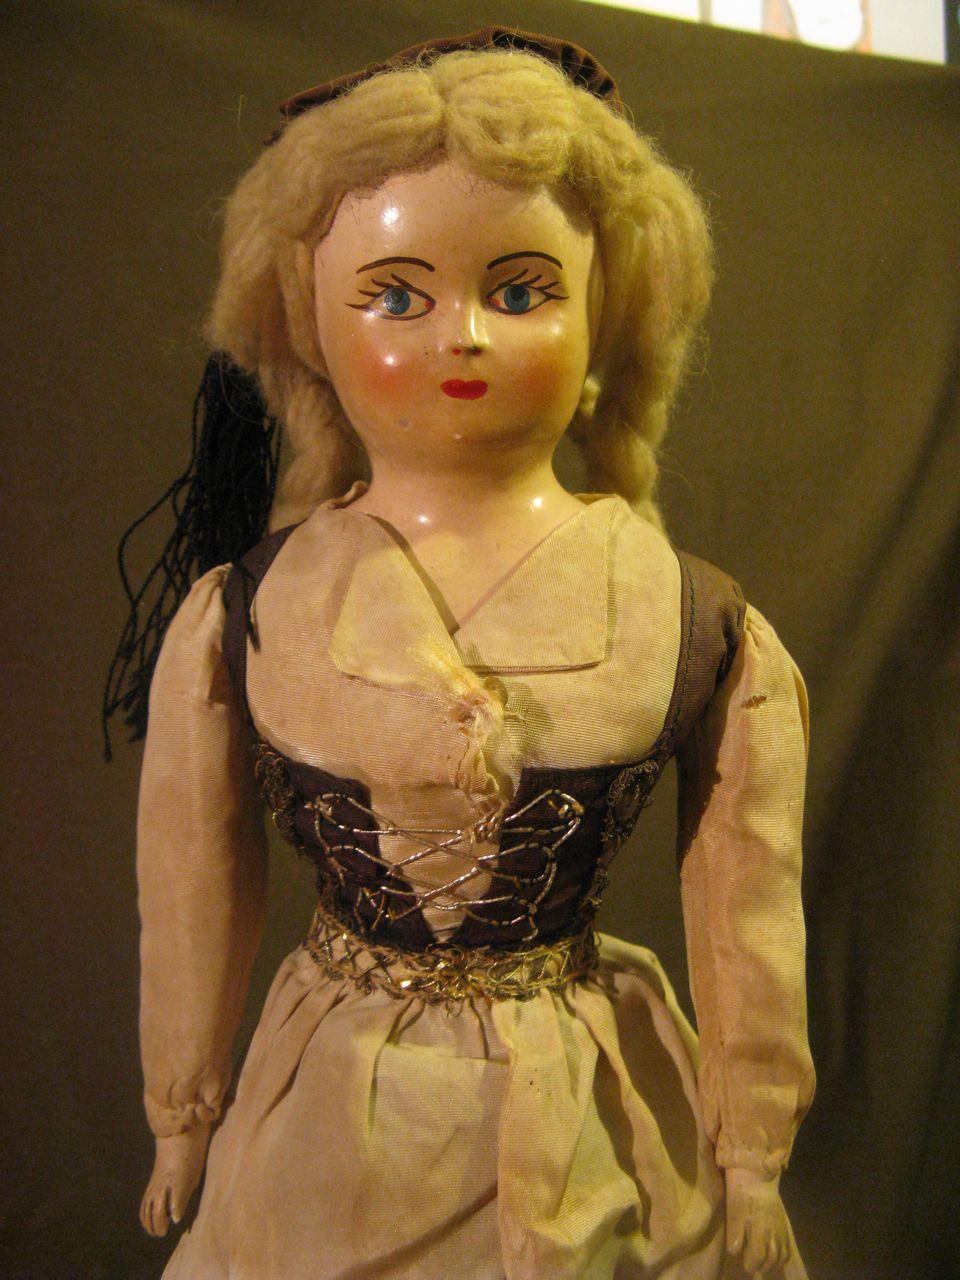 Eastern European Composition Cloth Doll, Mid 1900's